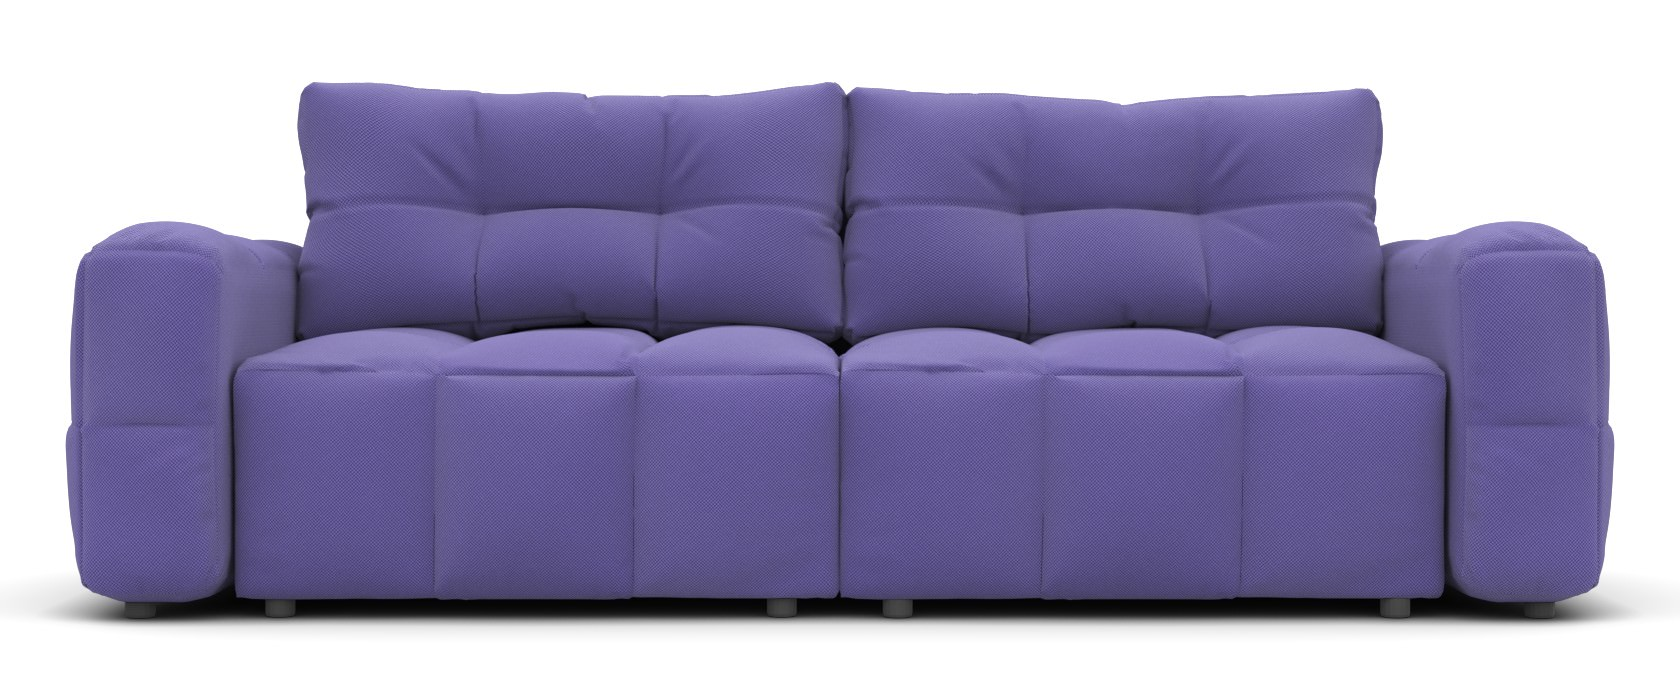 Тримісний диван Leonardo - Pufetto